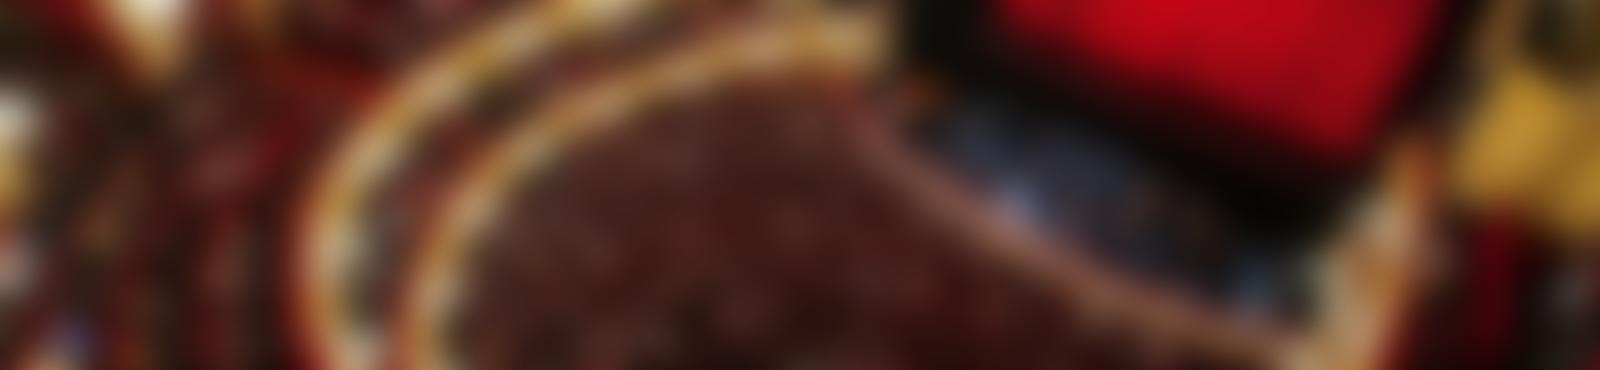 Blurred saal zauberfloete02 fav 1 15x10  gg